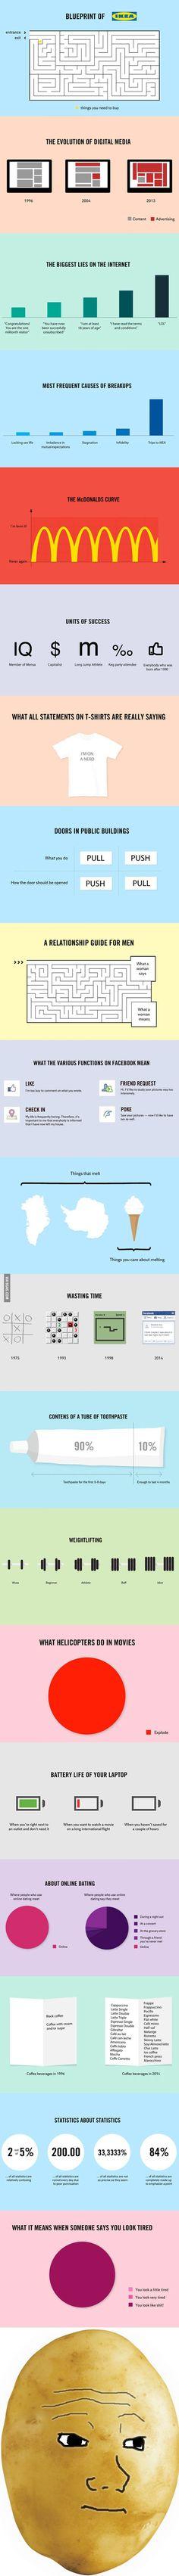 Fun fact info graphic